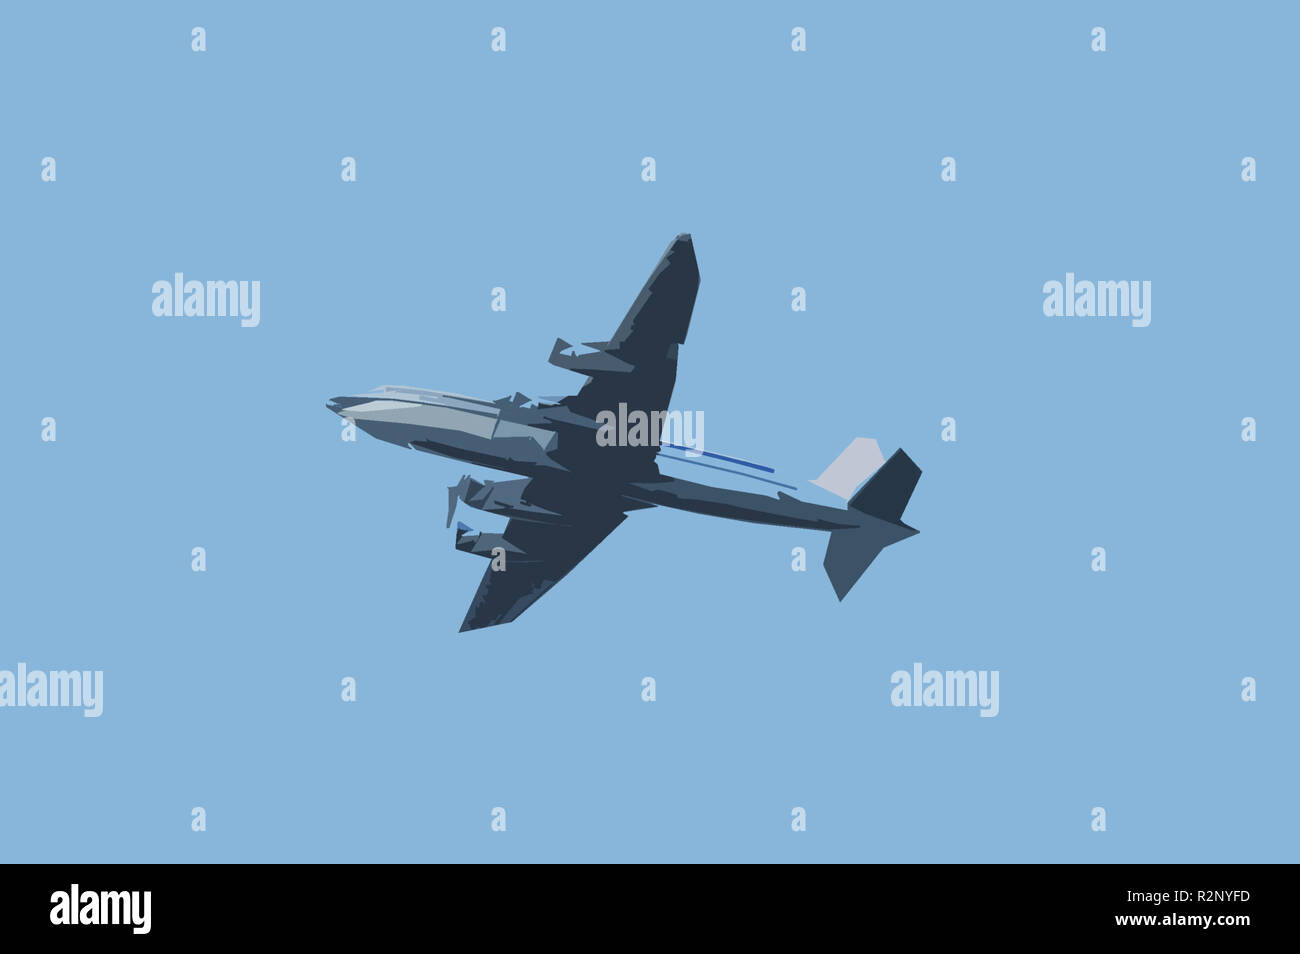 aircraft - Stock Image